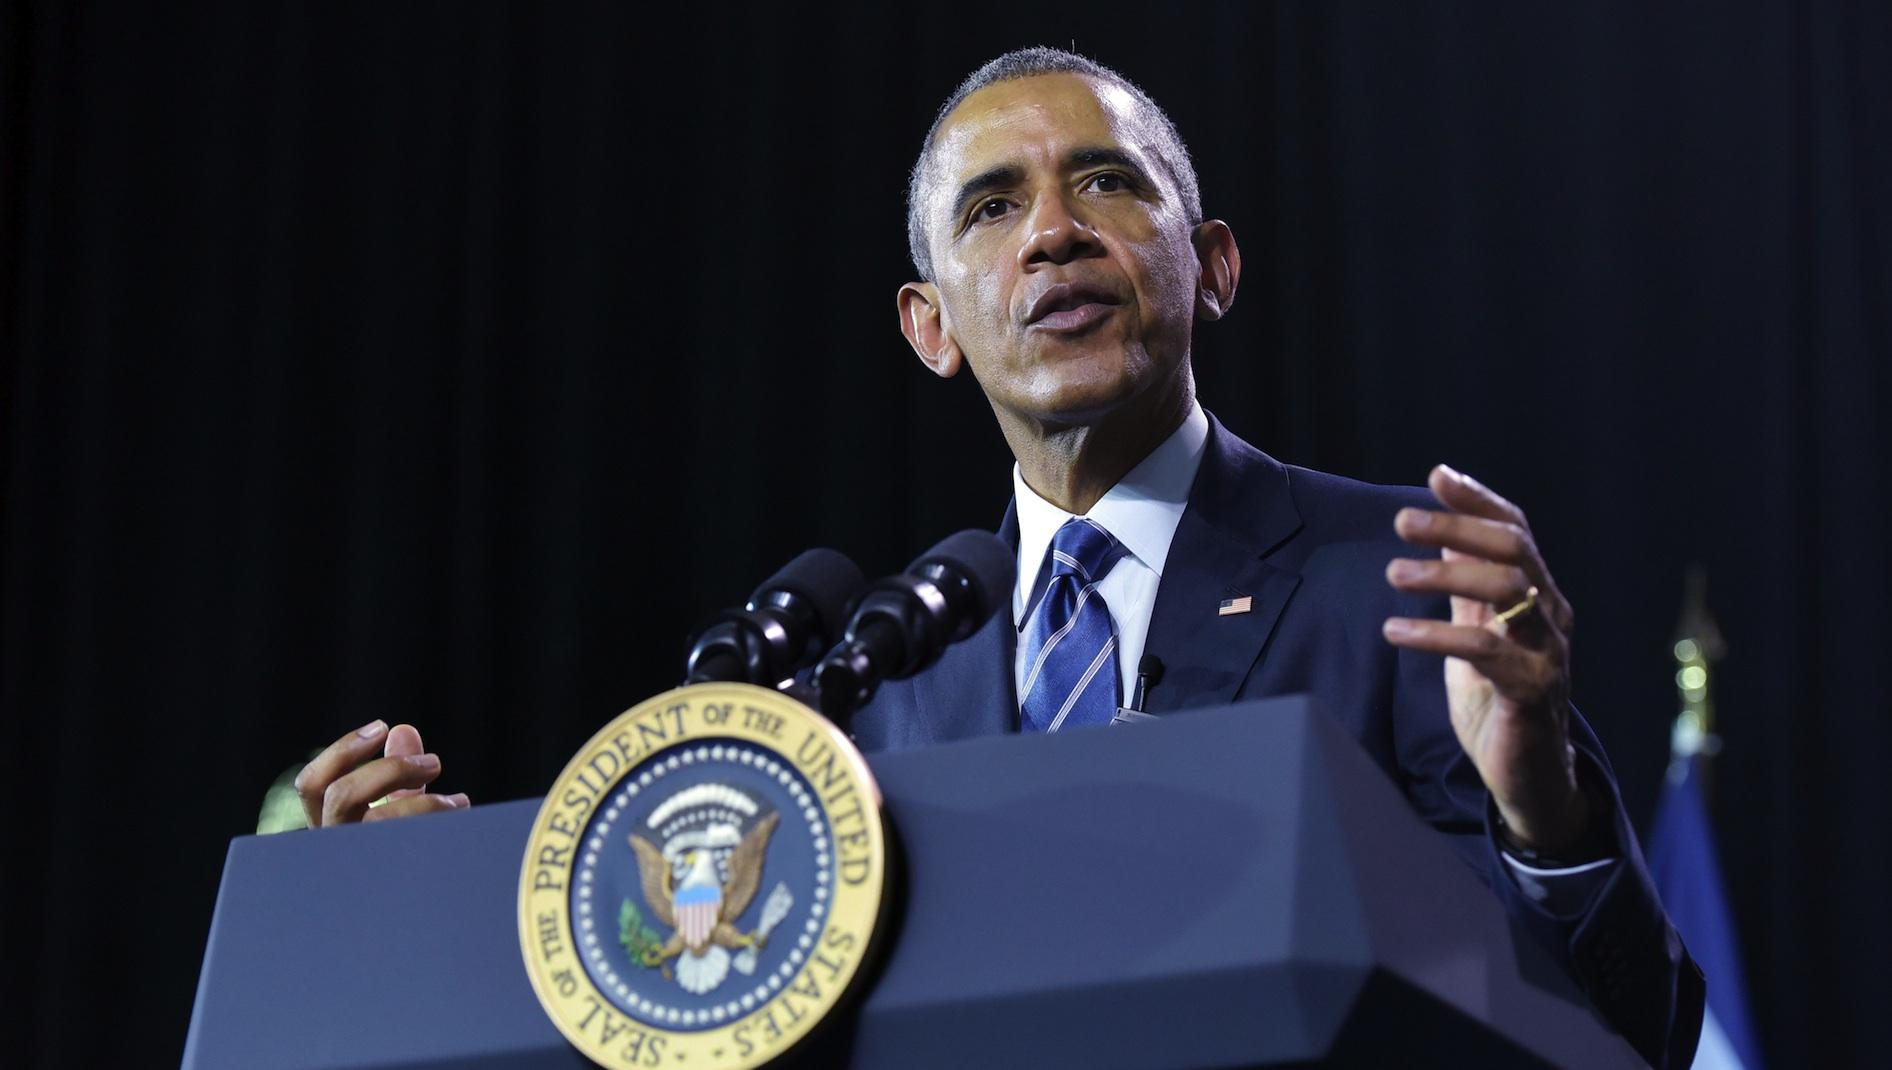 Obama announces new steps to combat heroin, prescription drug abuse